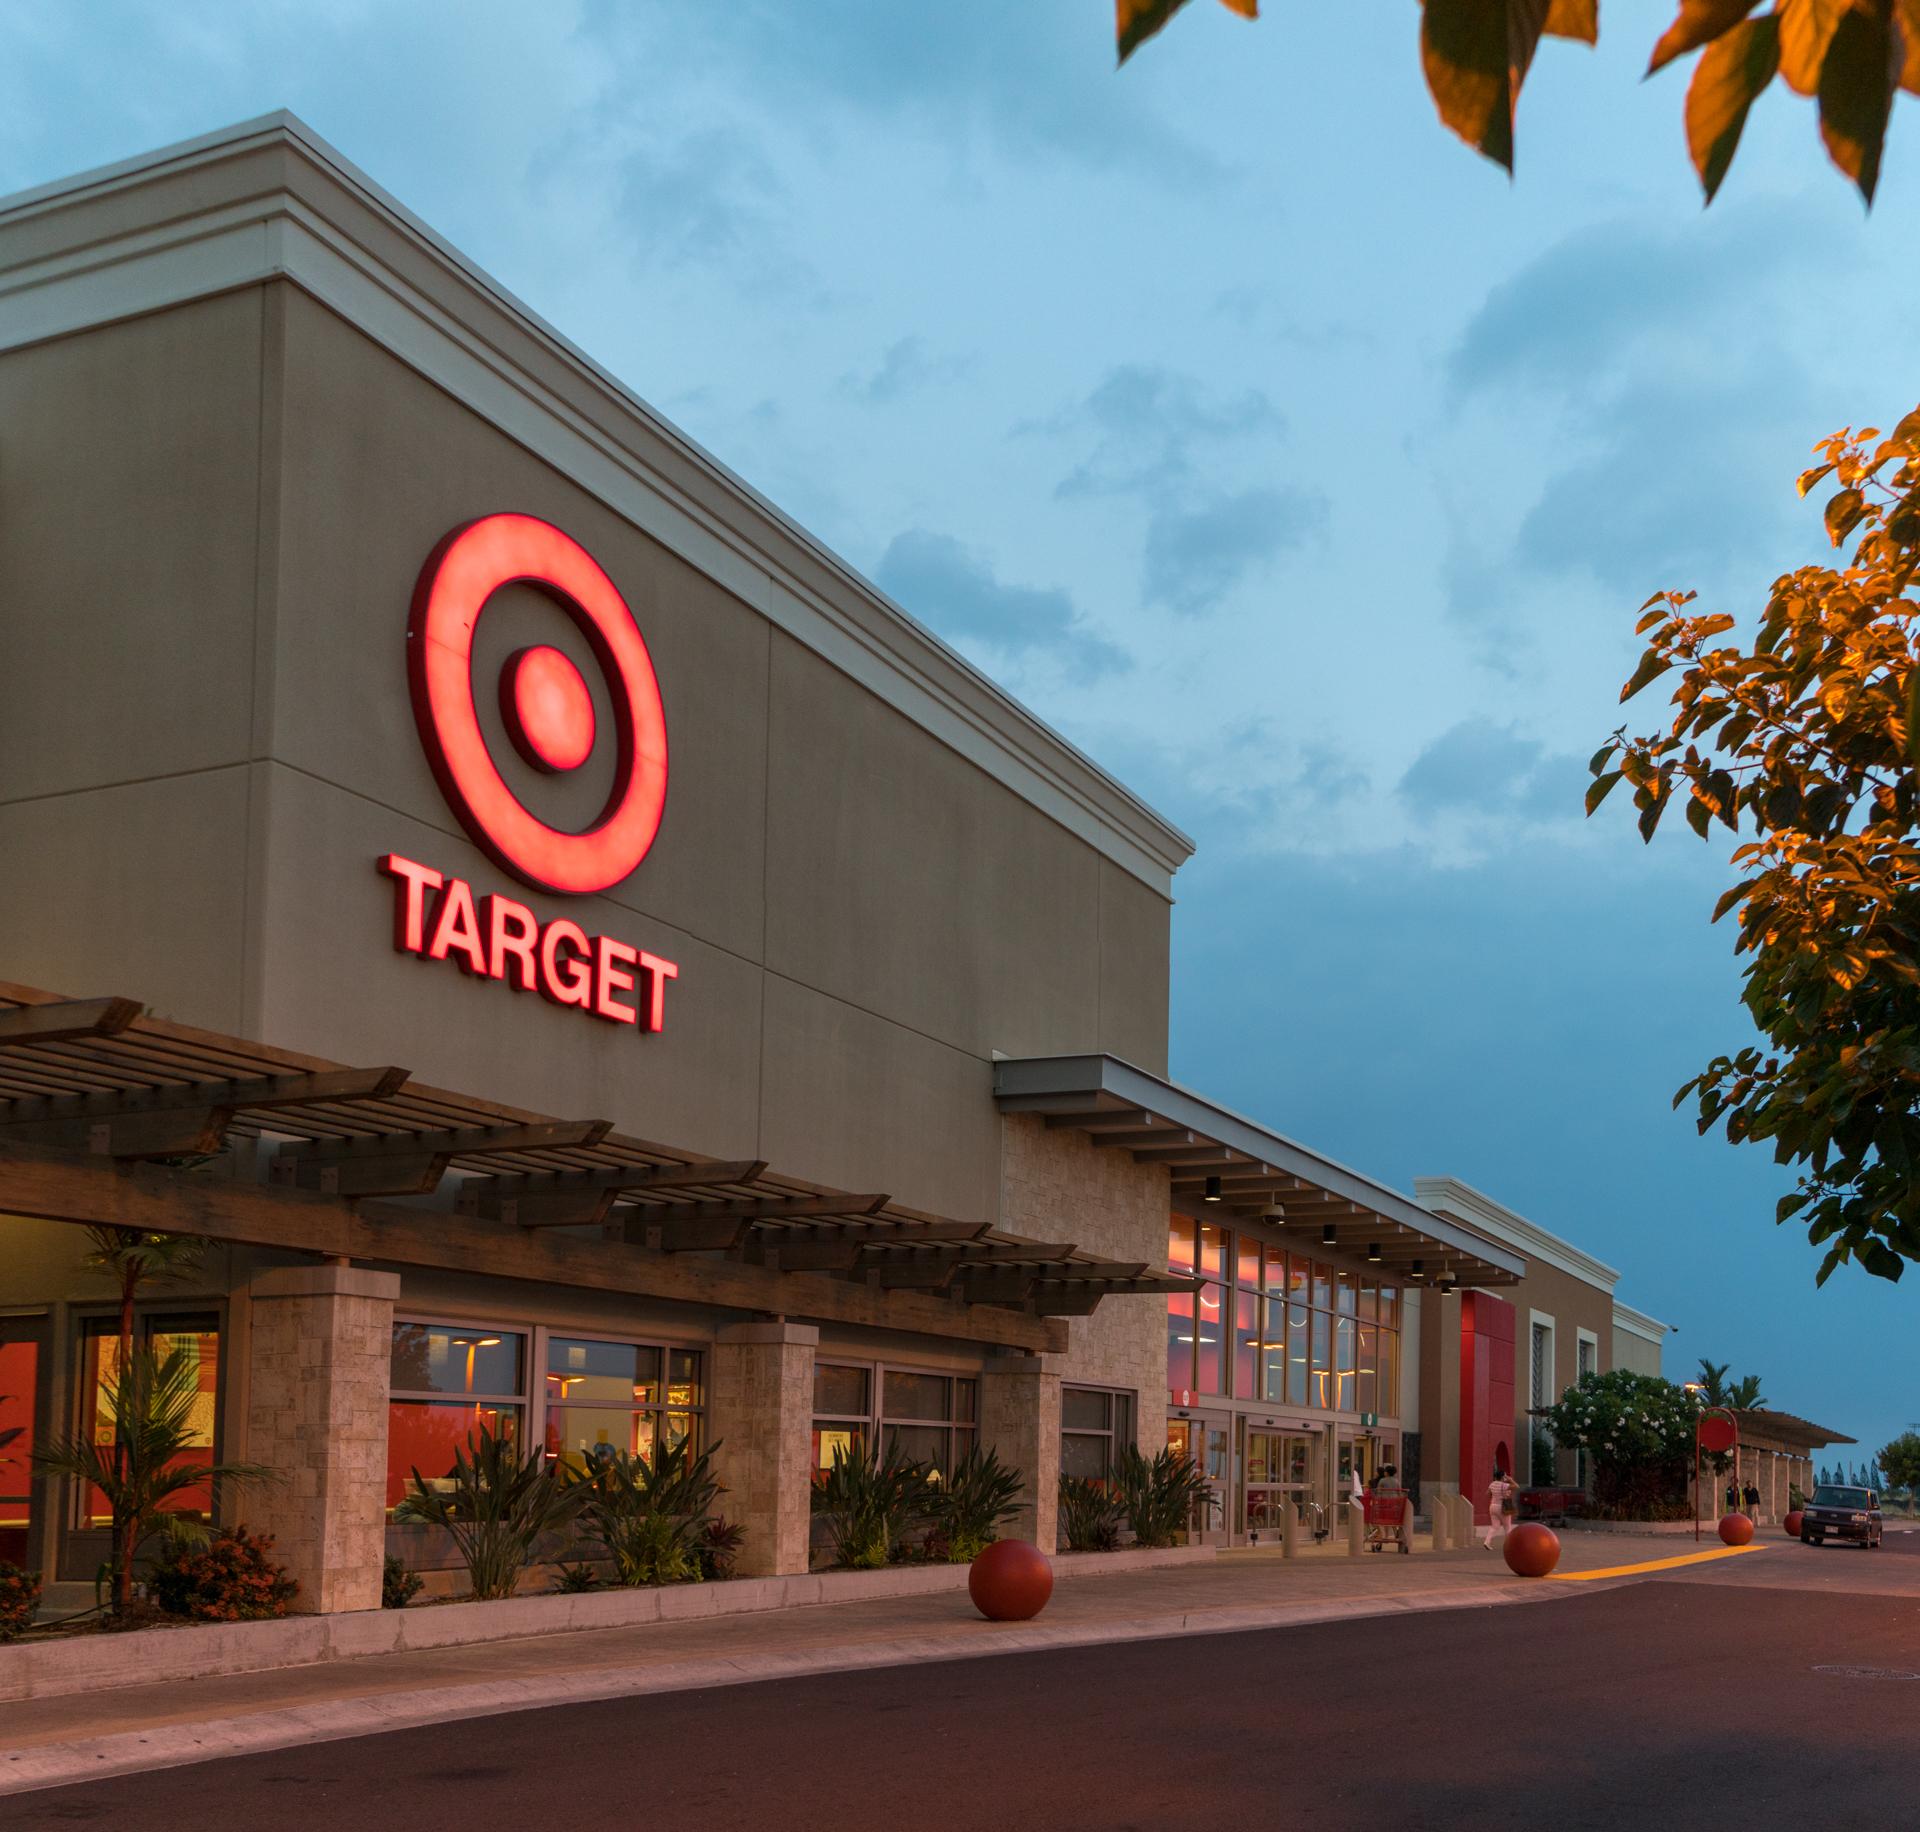 Target-Exterior2.jpg